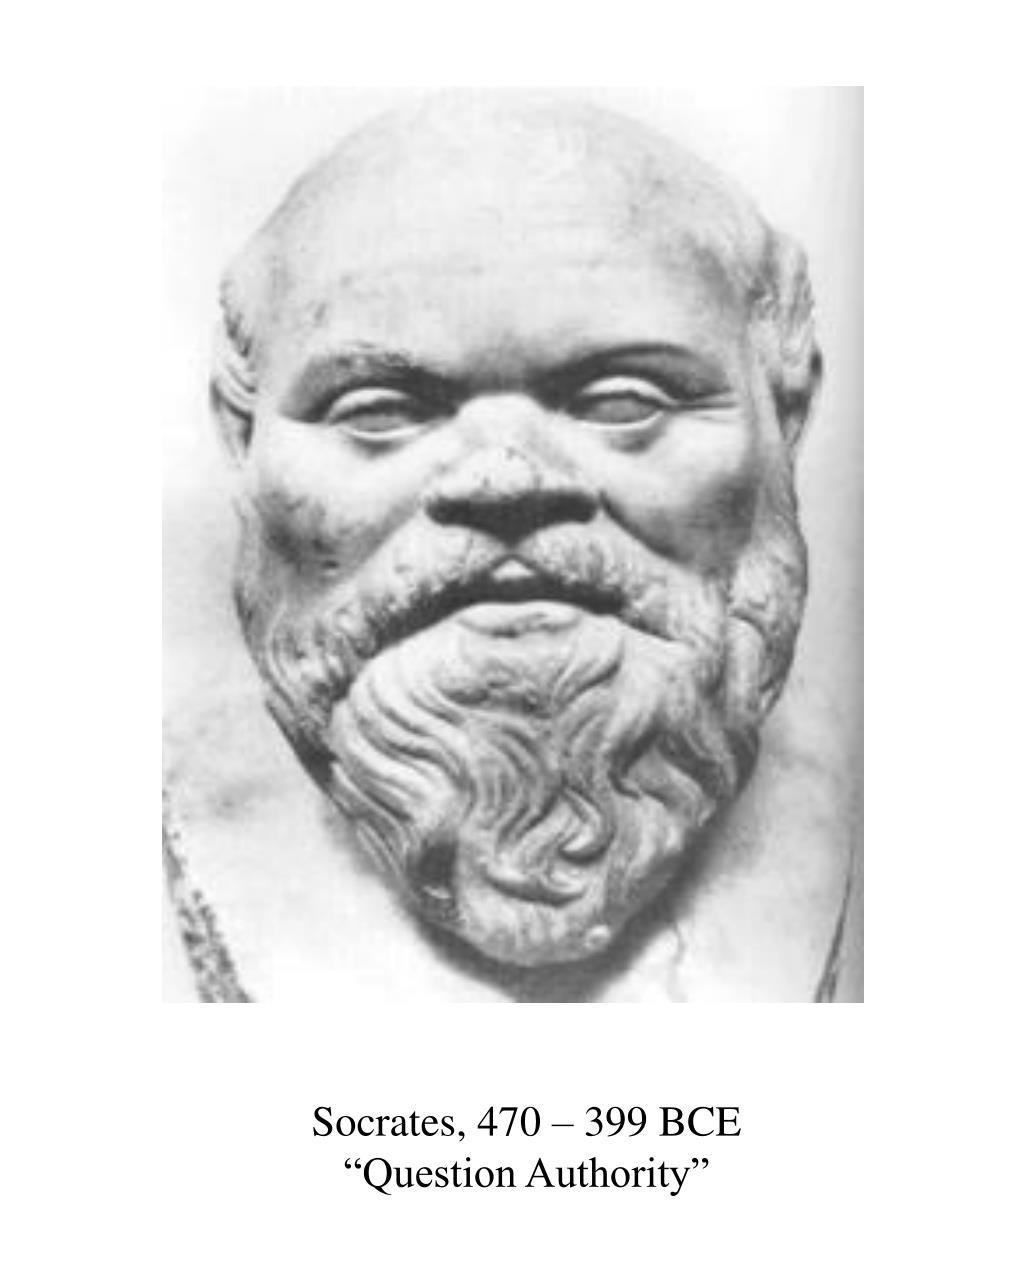 Socrates, 470 – 399 BCE